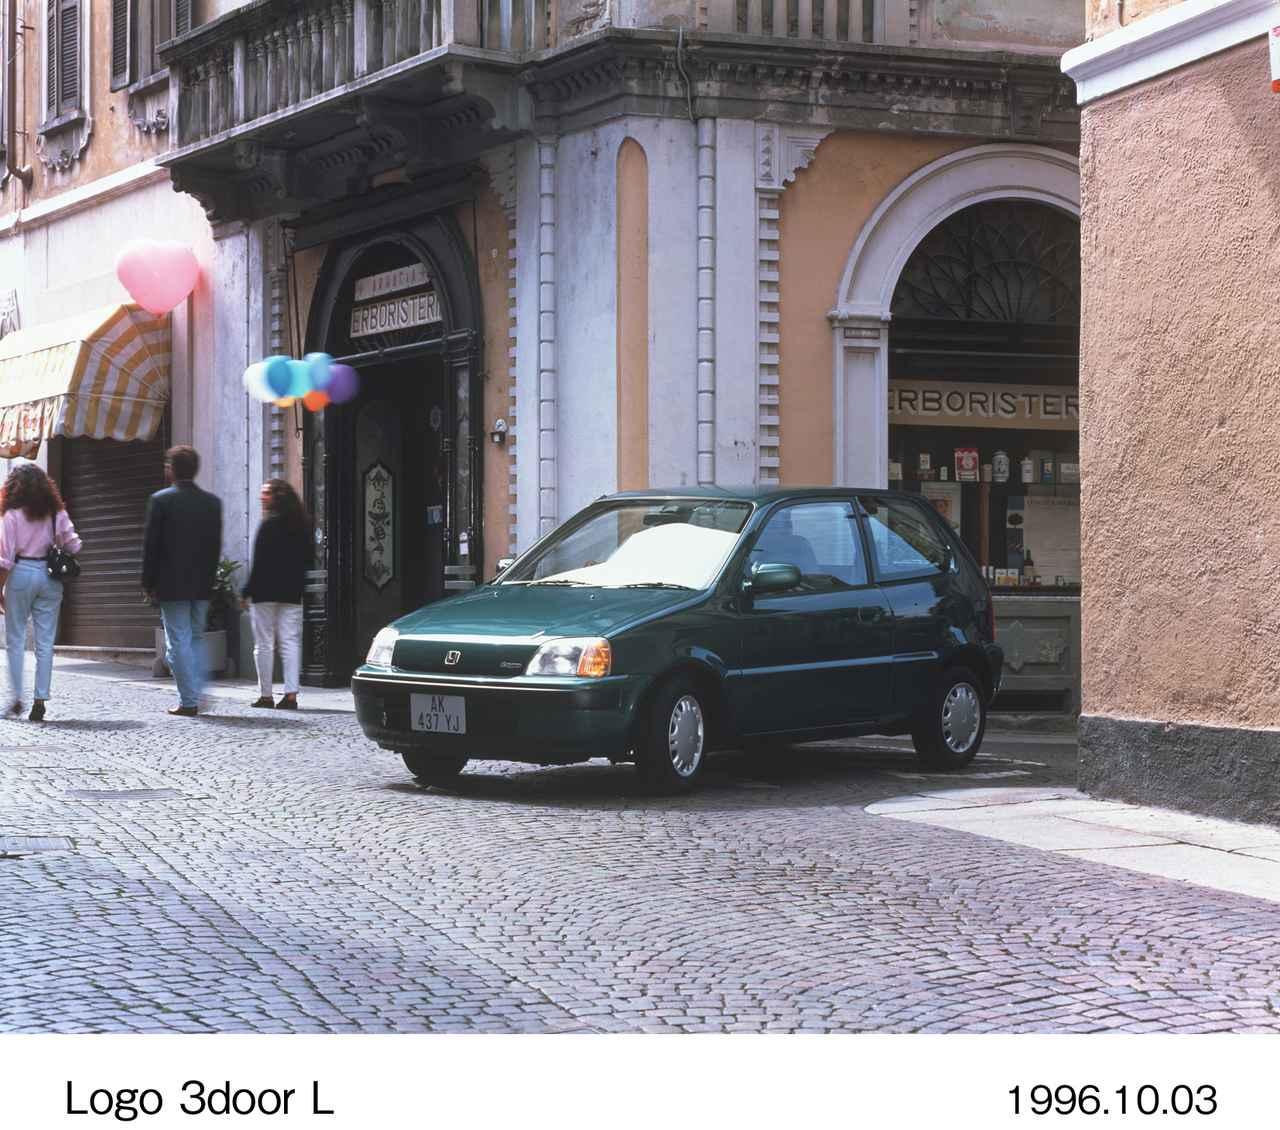 Images : 8番目の画像 - ホンダロゴ関連の画像はこちら(クリックして拡大) - A Little Honda | ア・リトル・ホンダ(リトホン)